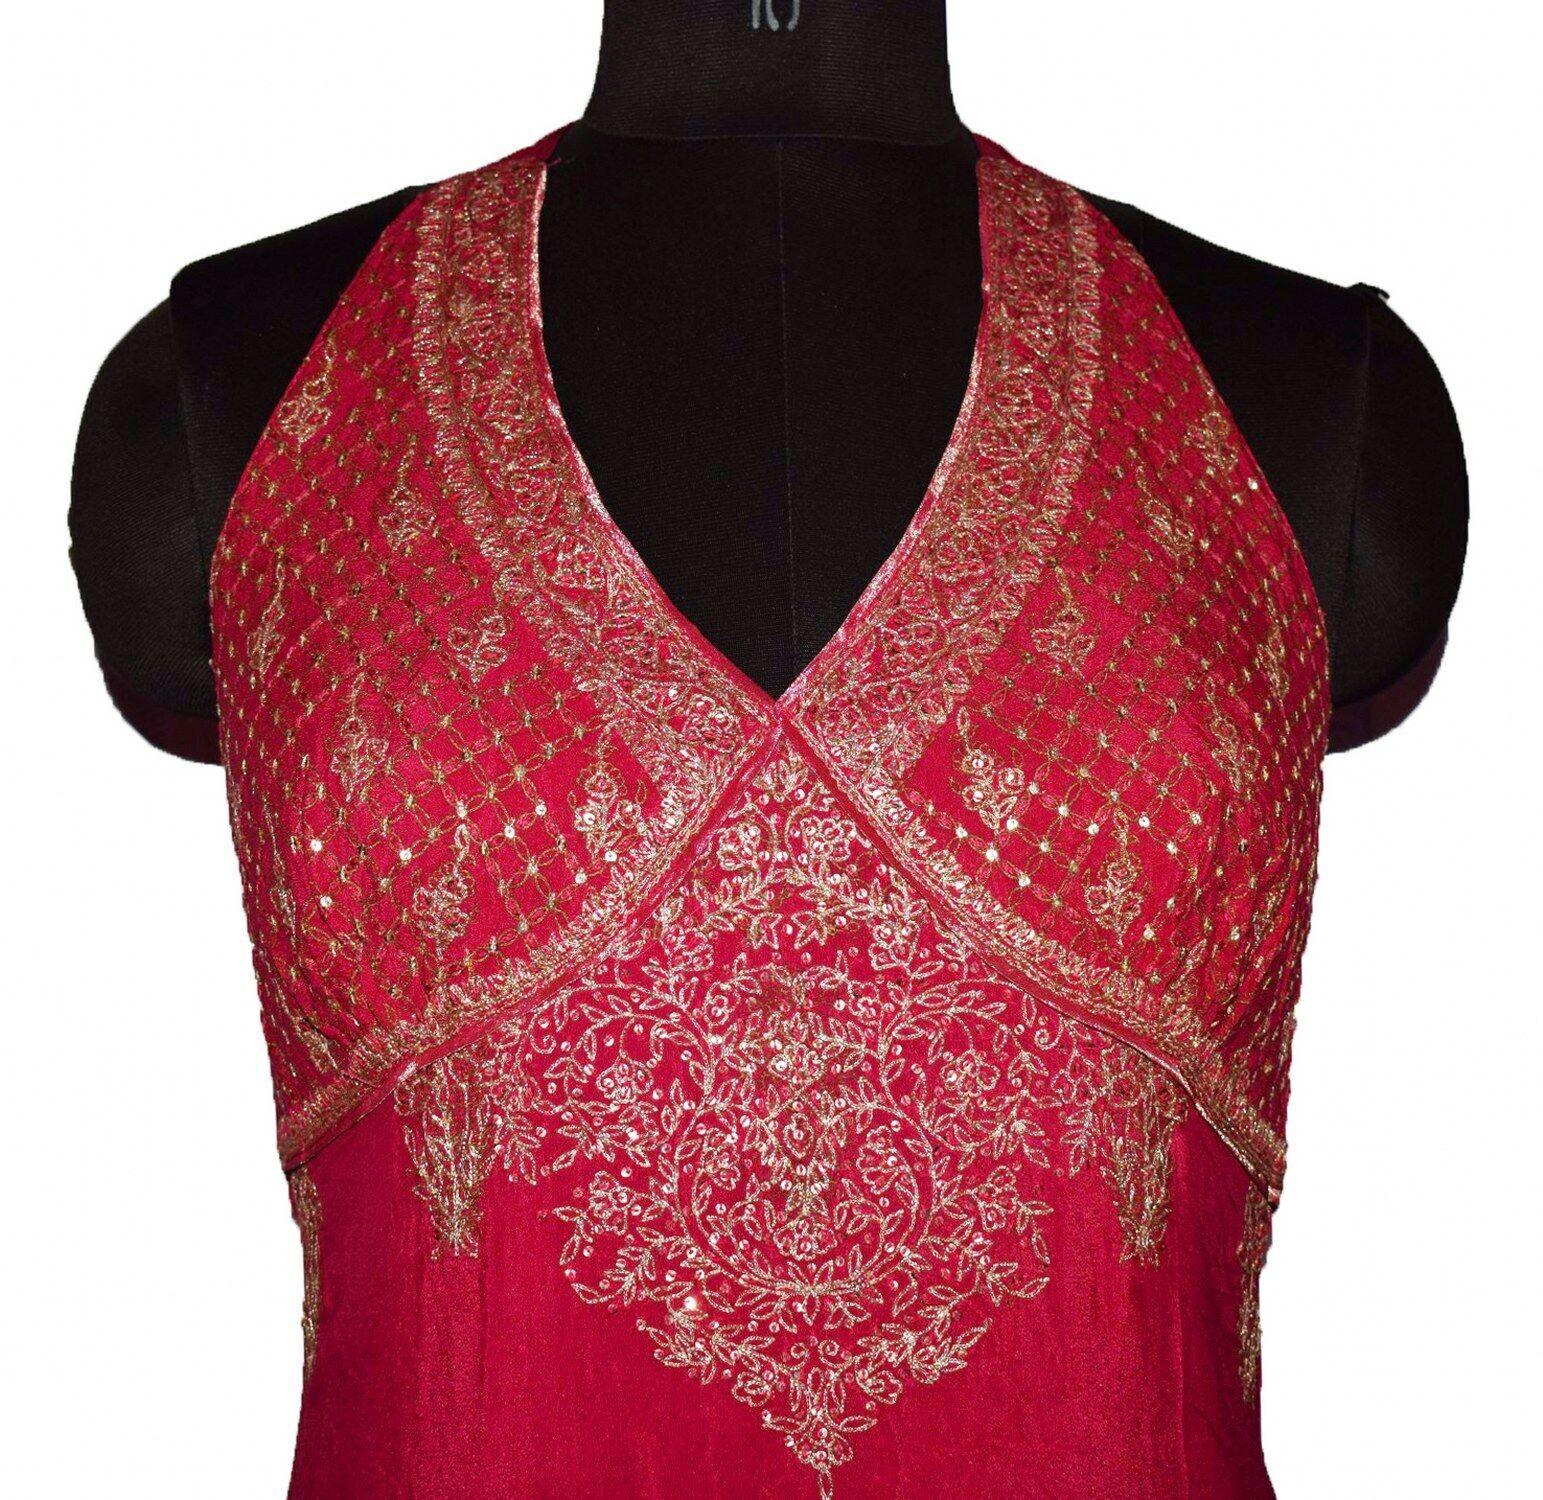 INDIAN DESIGNER RITU KUMAR SEXY BACL LESS DRESS V… - image 4